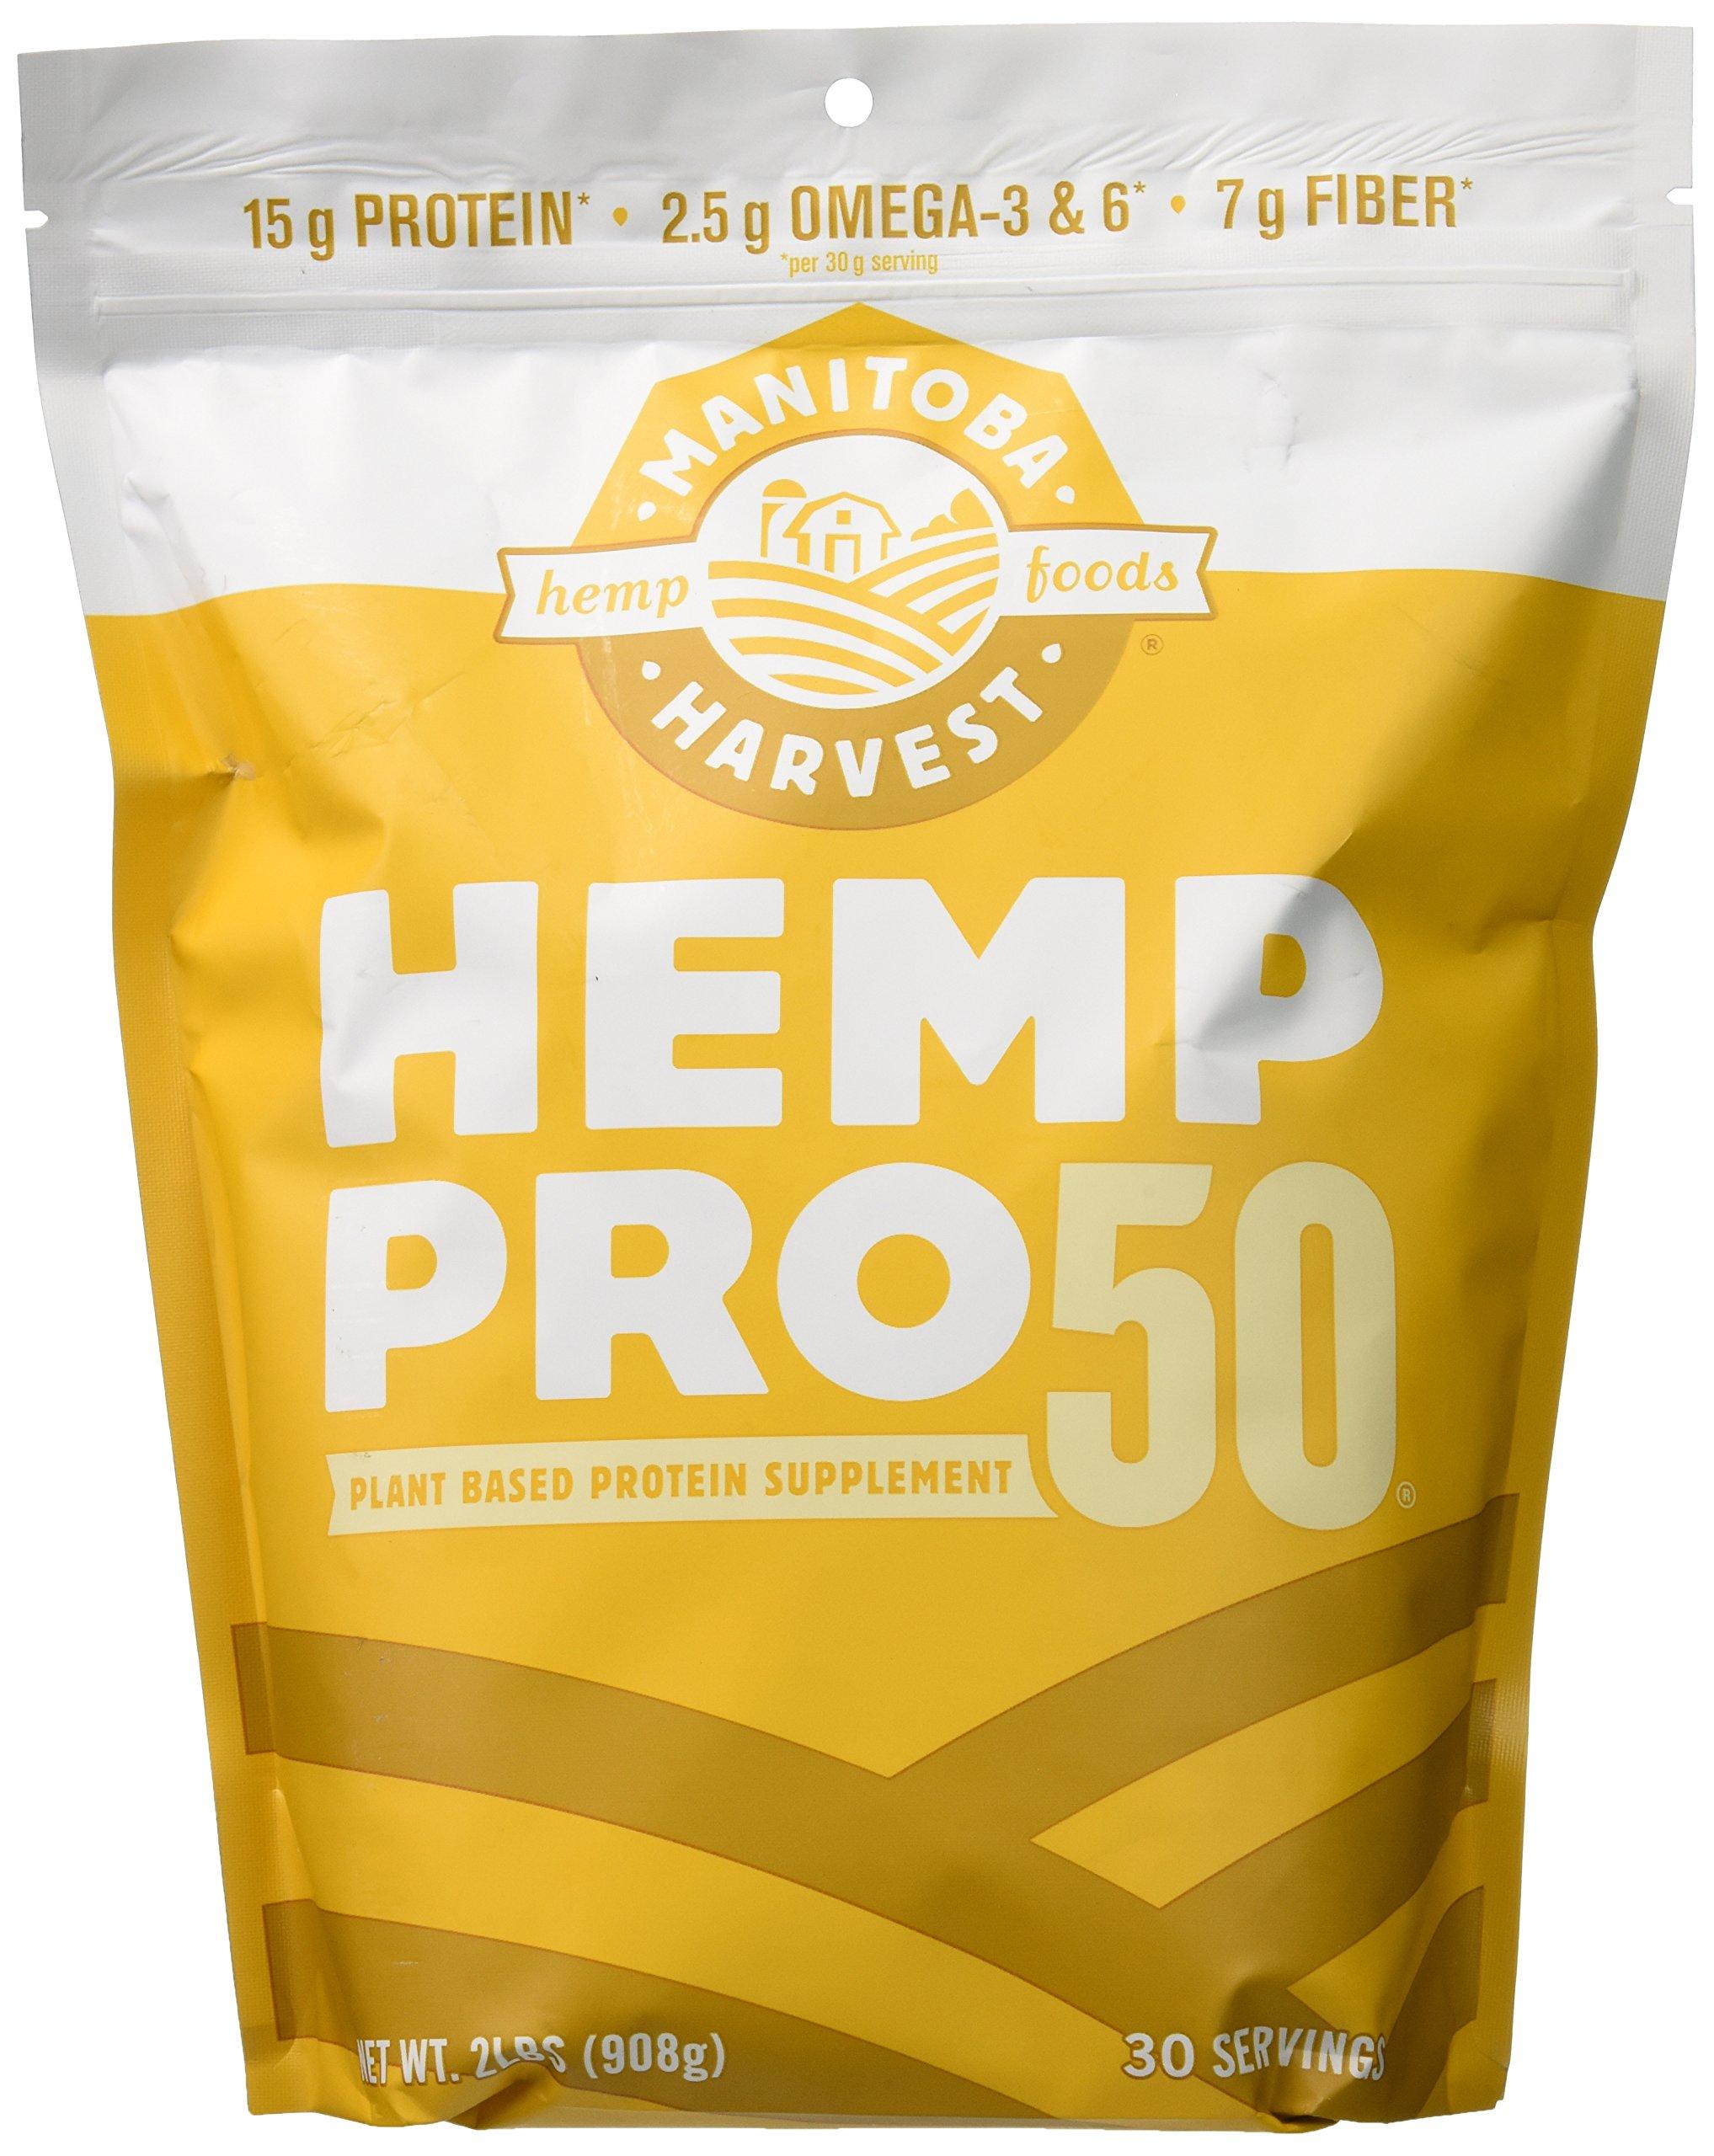 Manitoba Harvest Hemp Pro 50 Protein Powder, 32oz; with 15g of Protein & 7g of Fiber per Serving, Preservative-Free, Non-GMO